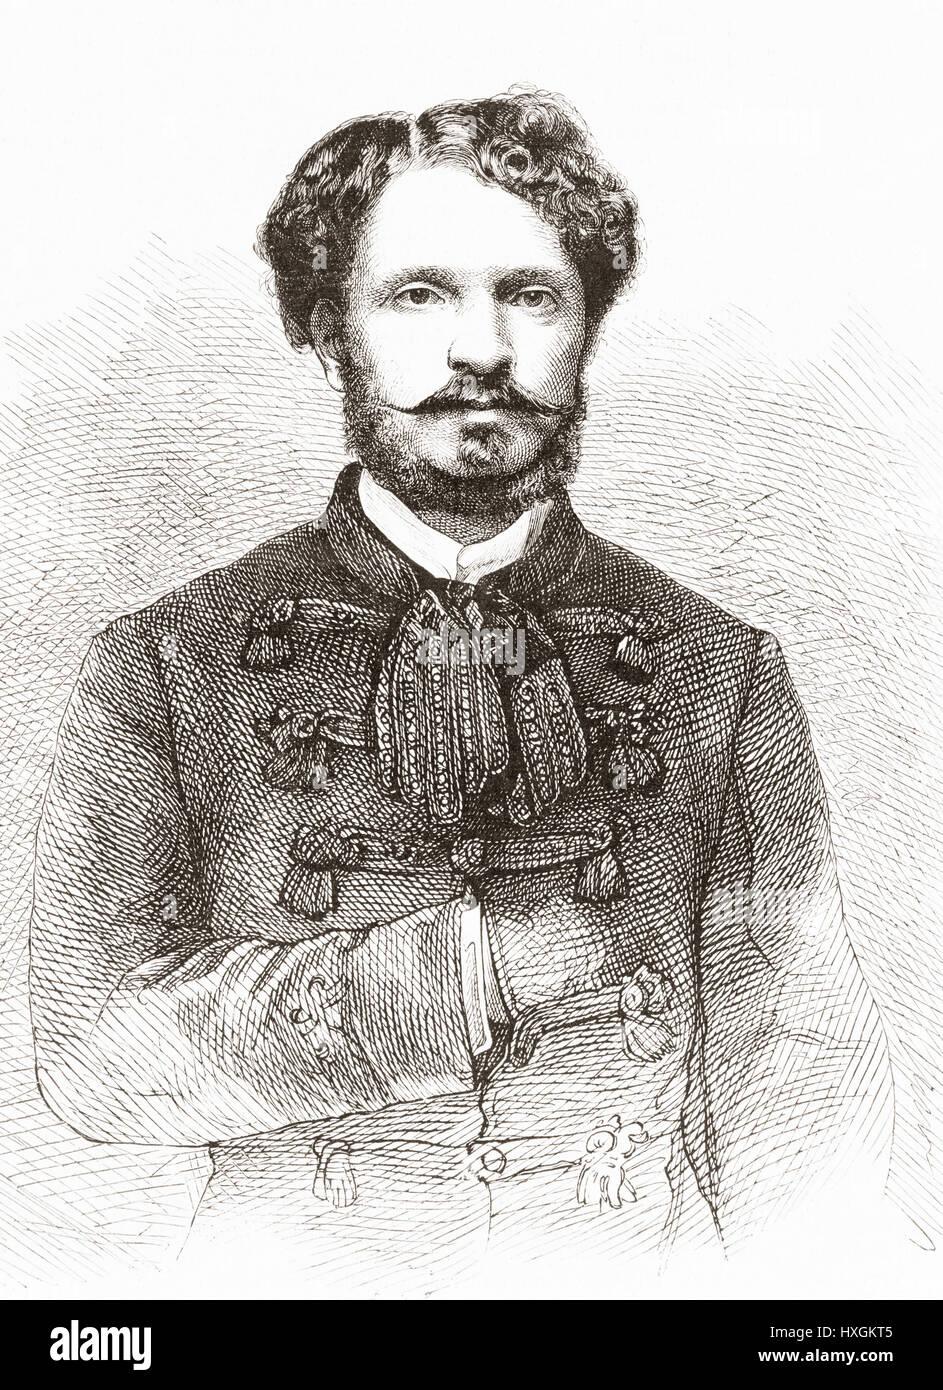 Count Gyula Andrássy de Csíkszentkirály et Krasznahorka, 1823 –1890.  Hungarian statesman,  Prime - Stock Image